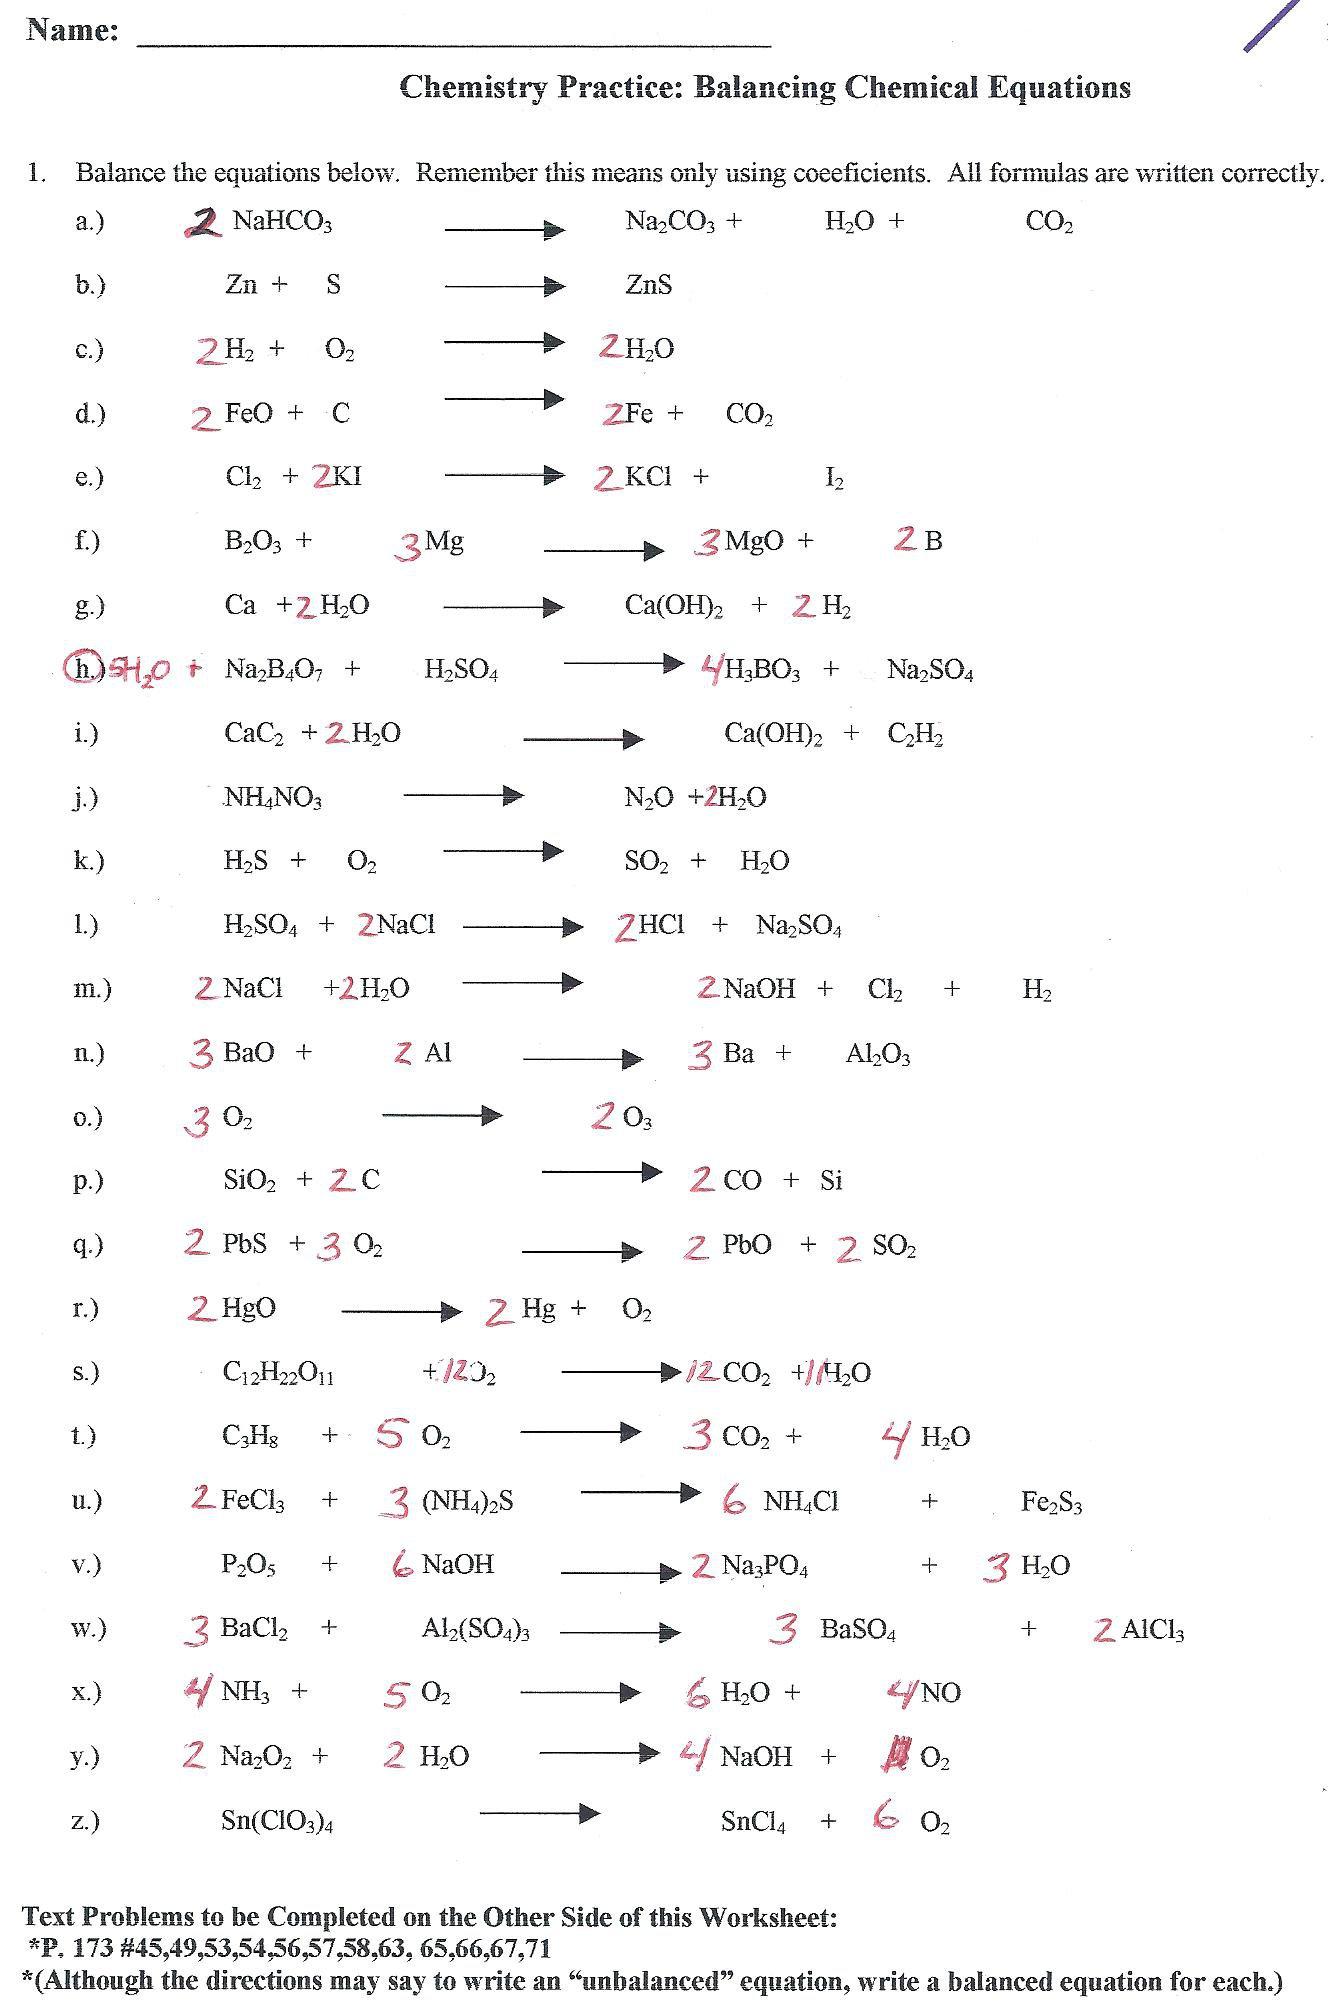 Chemical Equation Worksheet Answer Key The Best Worksheets Image